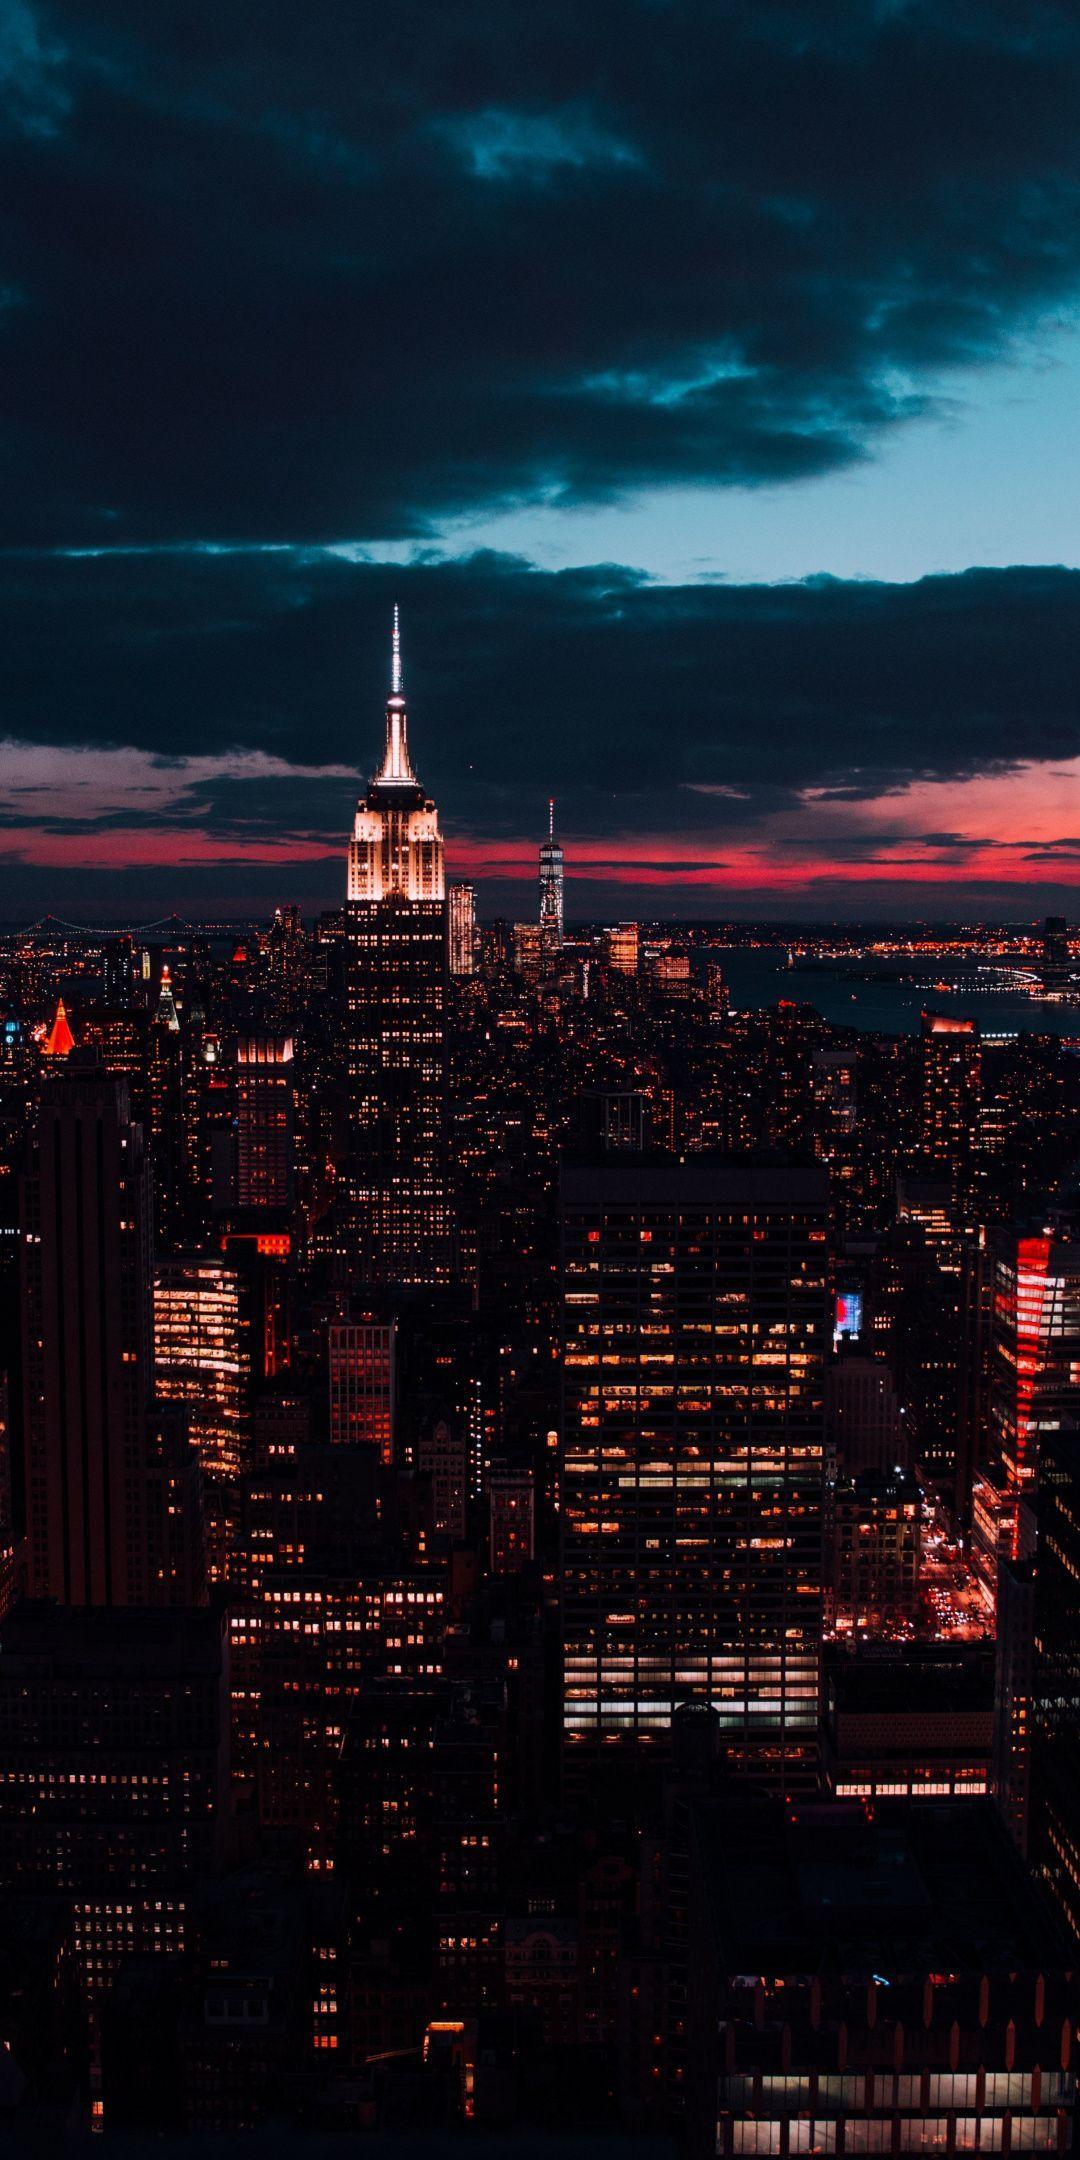 New york buildings night cityscape 1080x2160 wallpaper WIN 3 1080x2160